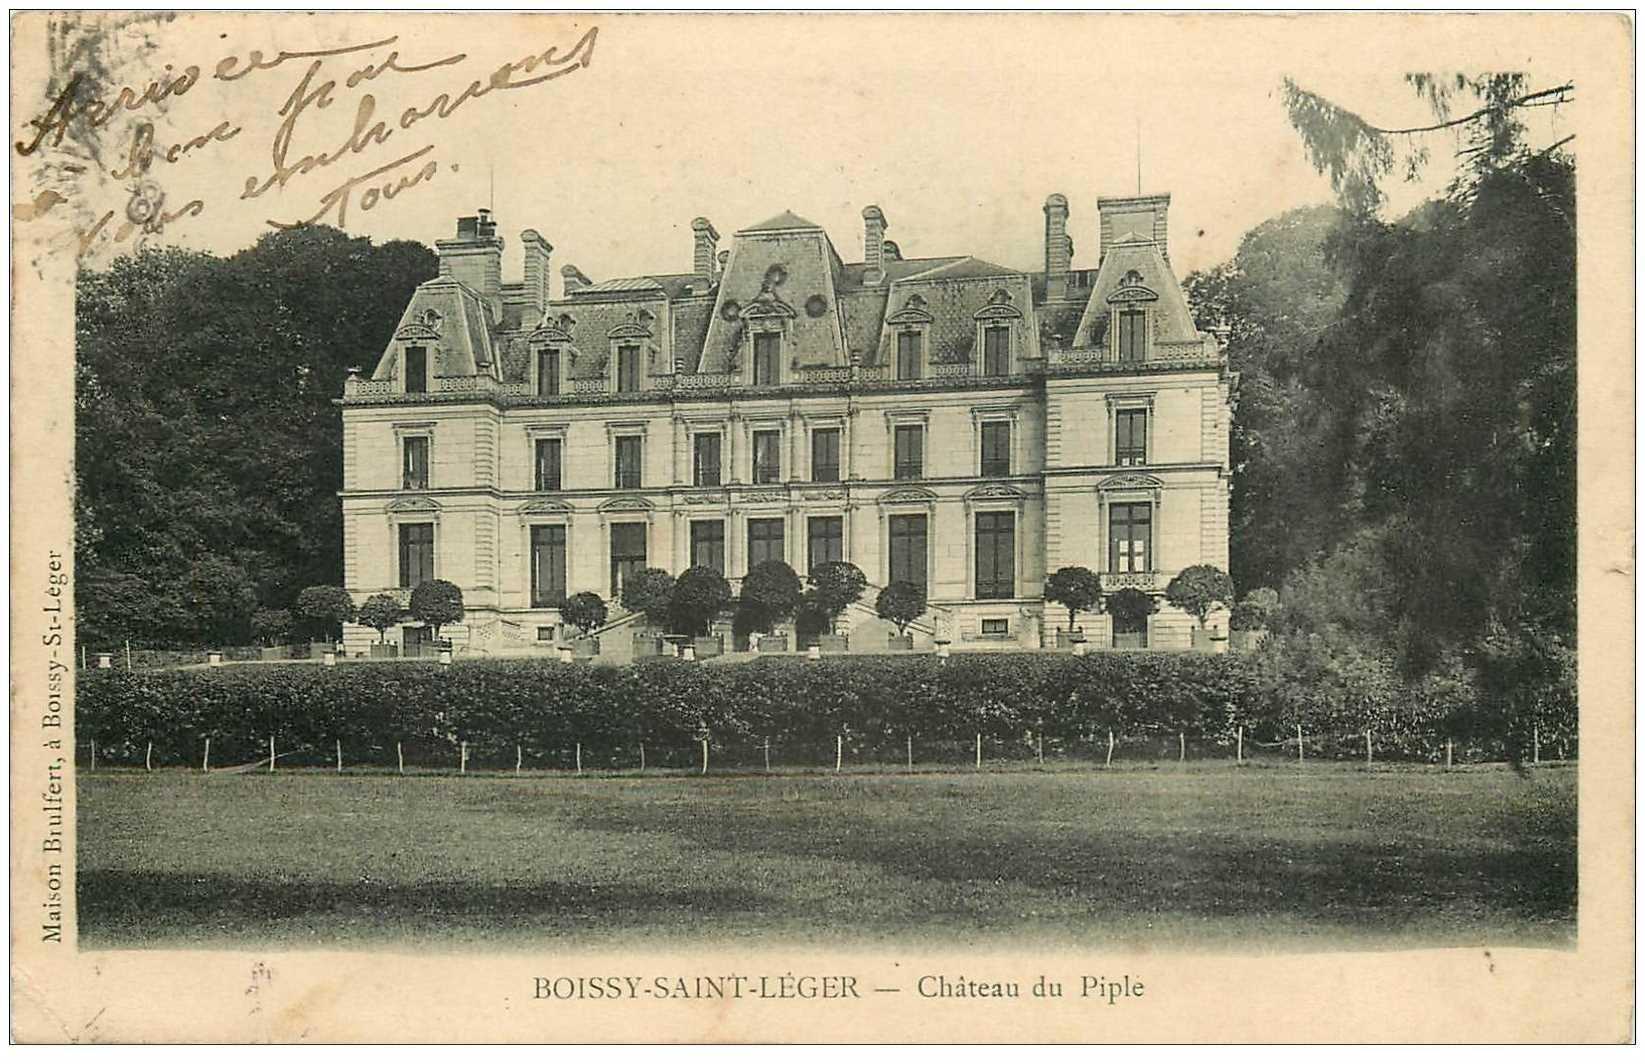 94 boissy saint leger ch teau du piple 1903. Black Bedroom Furniture Sets. Home Design Ideas